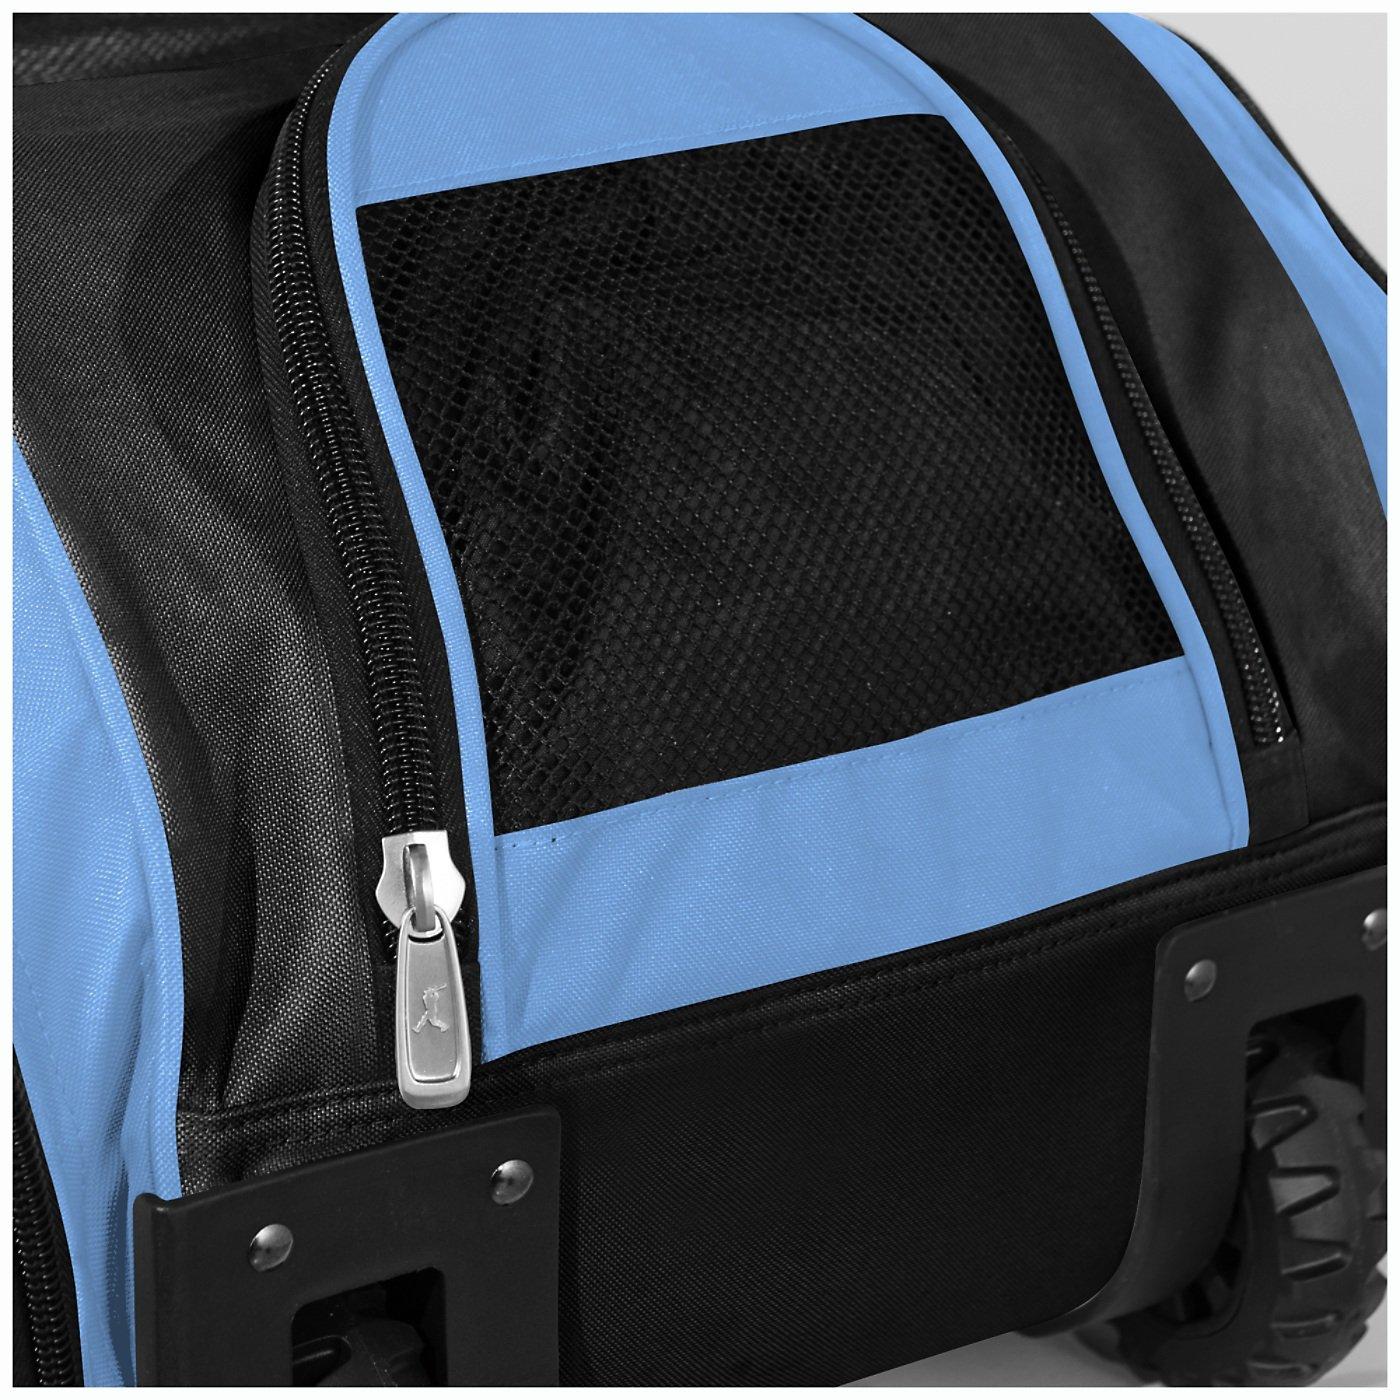 Boombah Beast Baseball/Softball Bat Bag - 40'' x 14'' x 13'' - Black/Columbia Blue - Holds 8 Bats, Glove & Shoe Compartments by Boombah (Image #4)